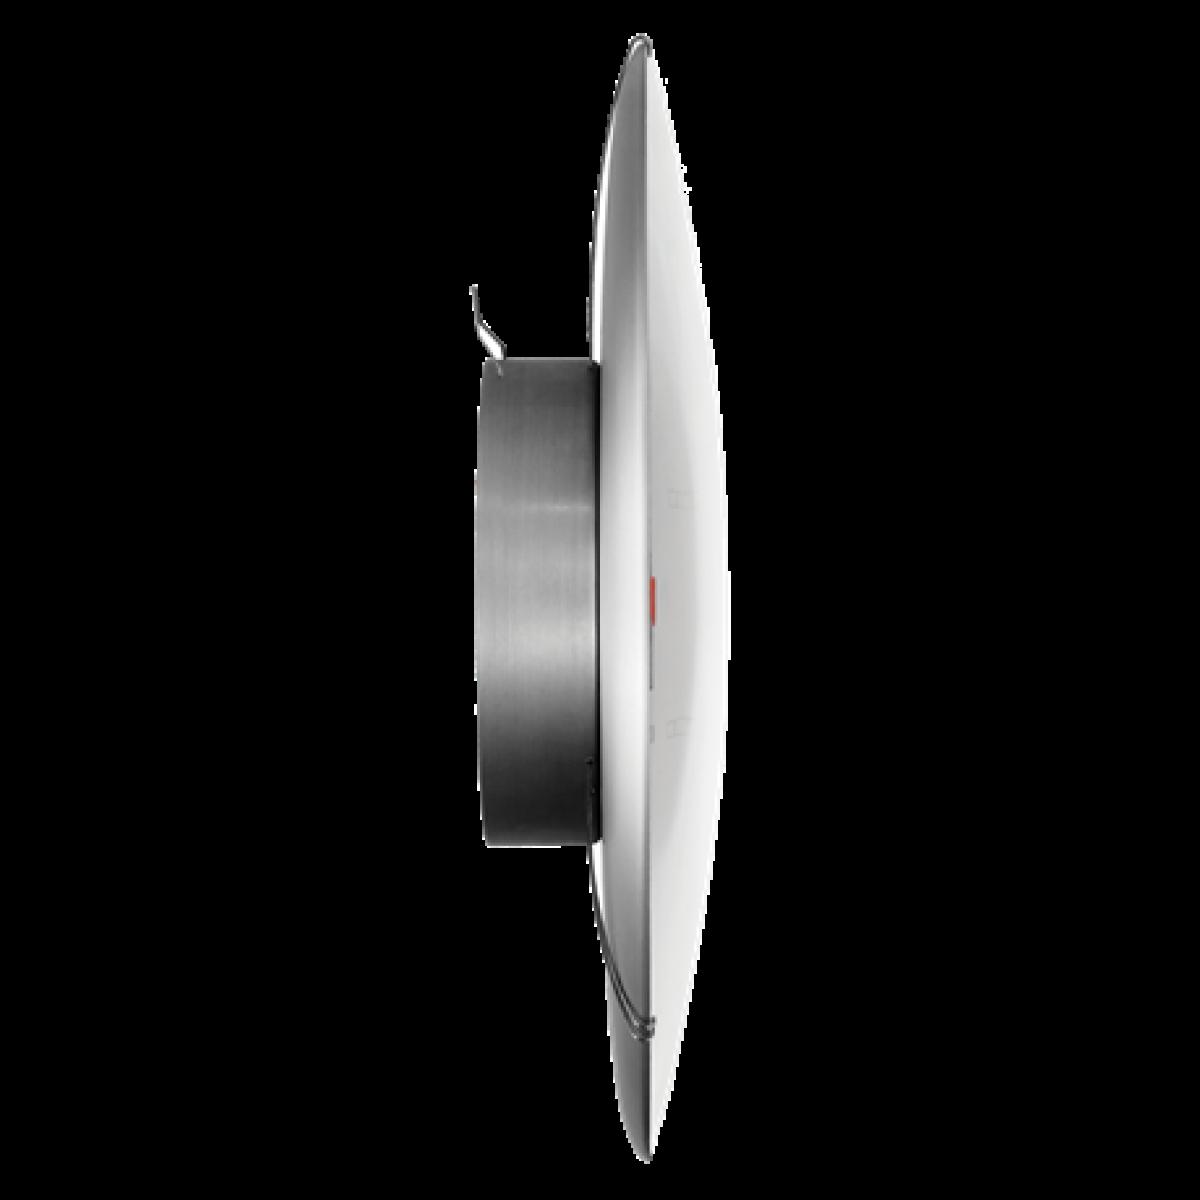 ARNEJACOBSENRomanvgur16cm-07